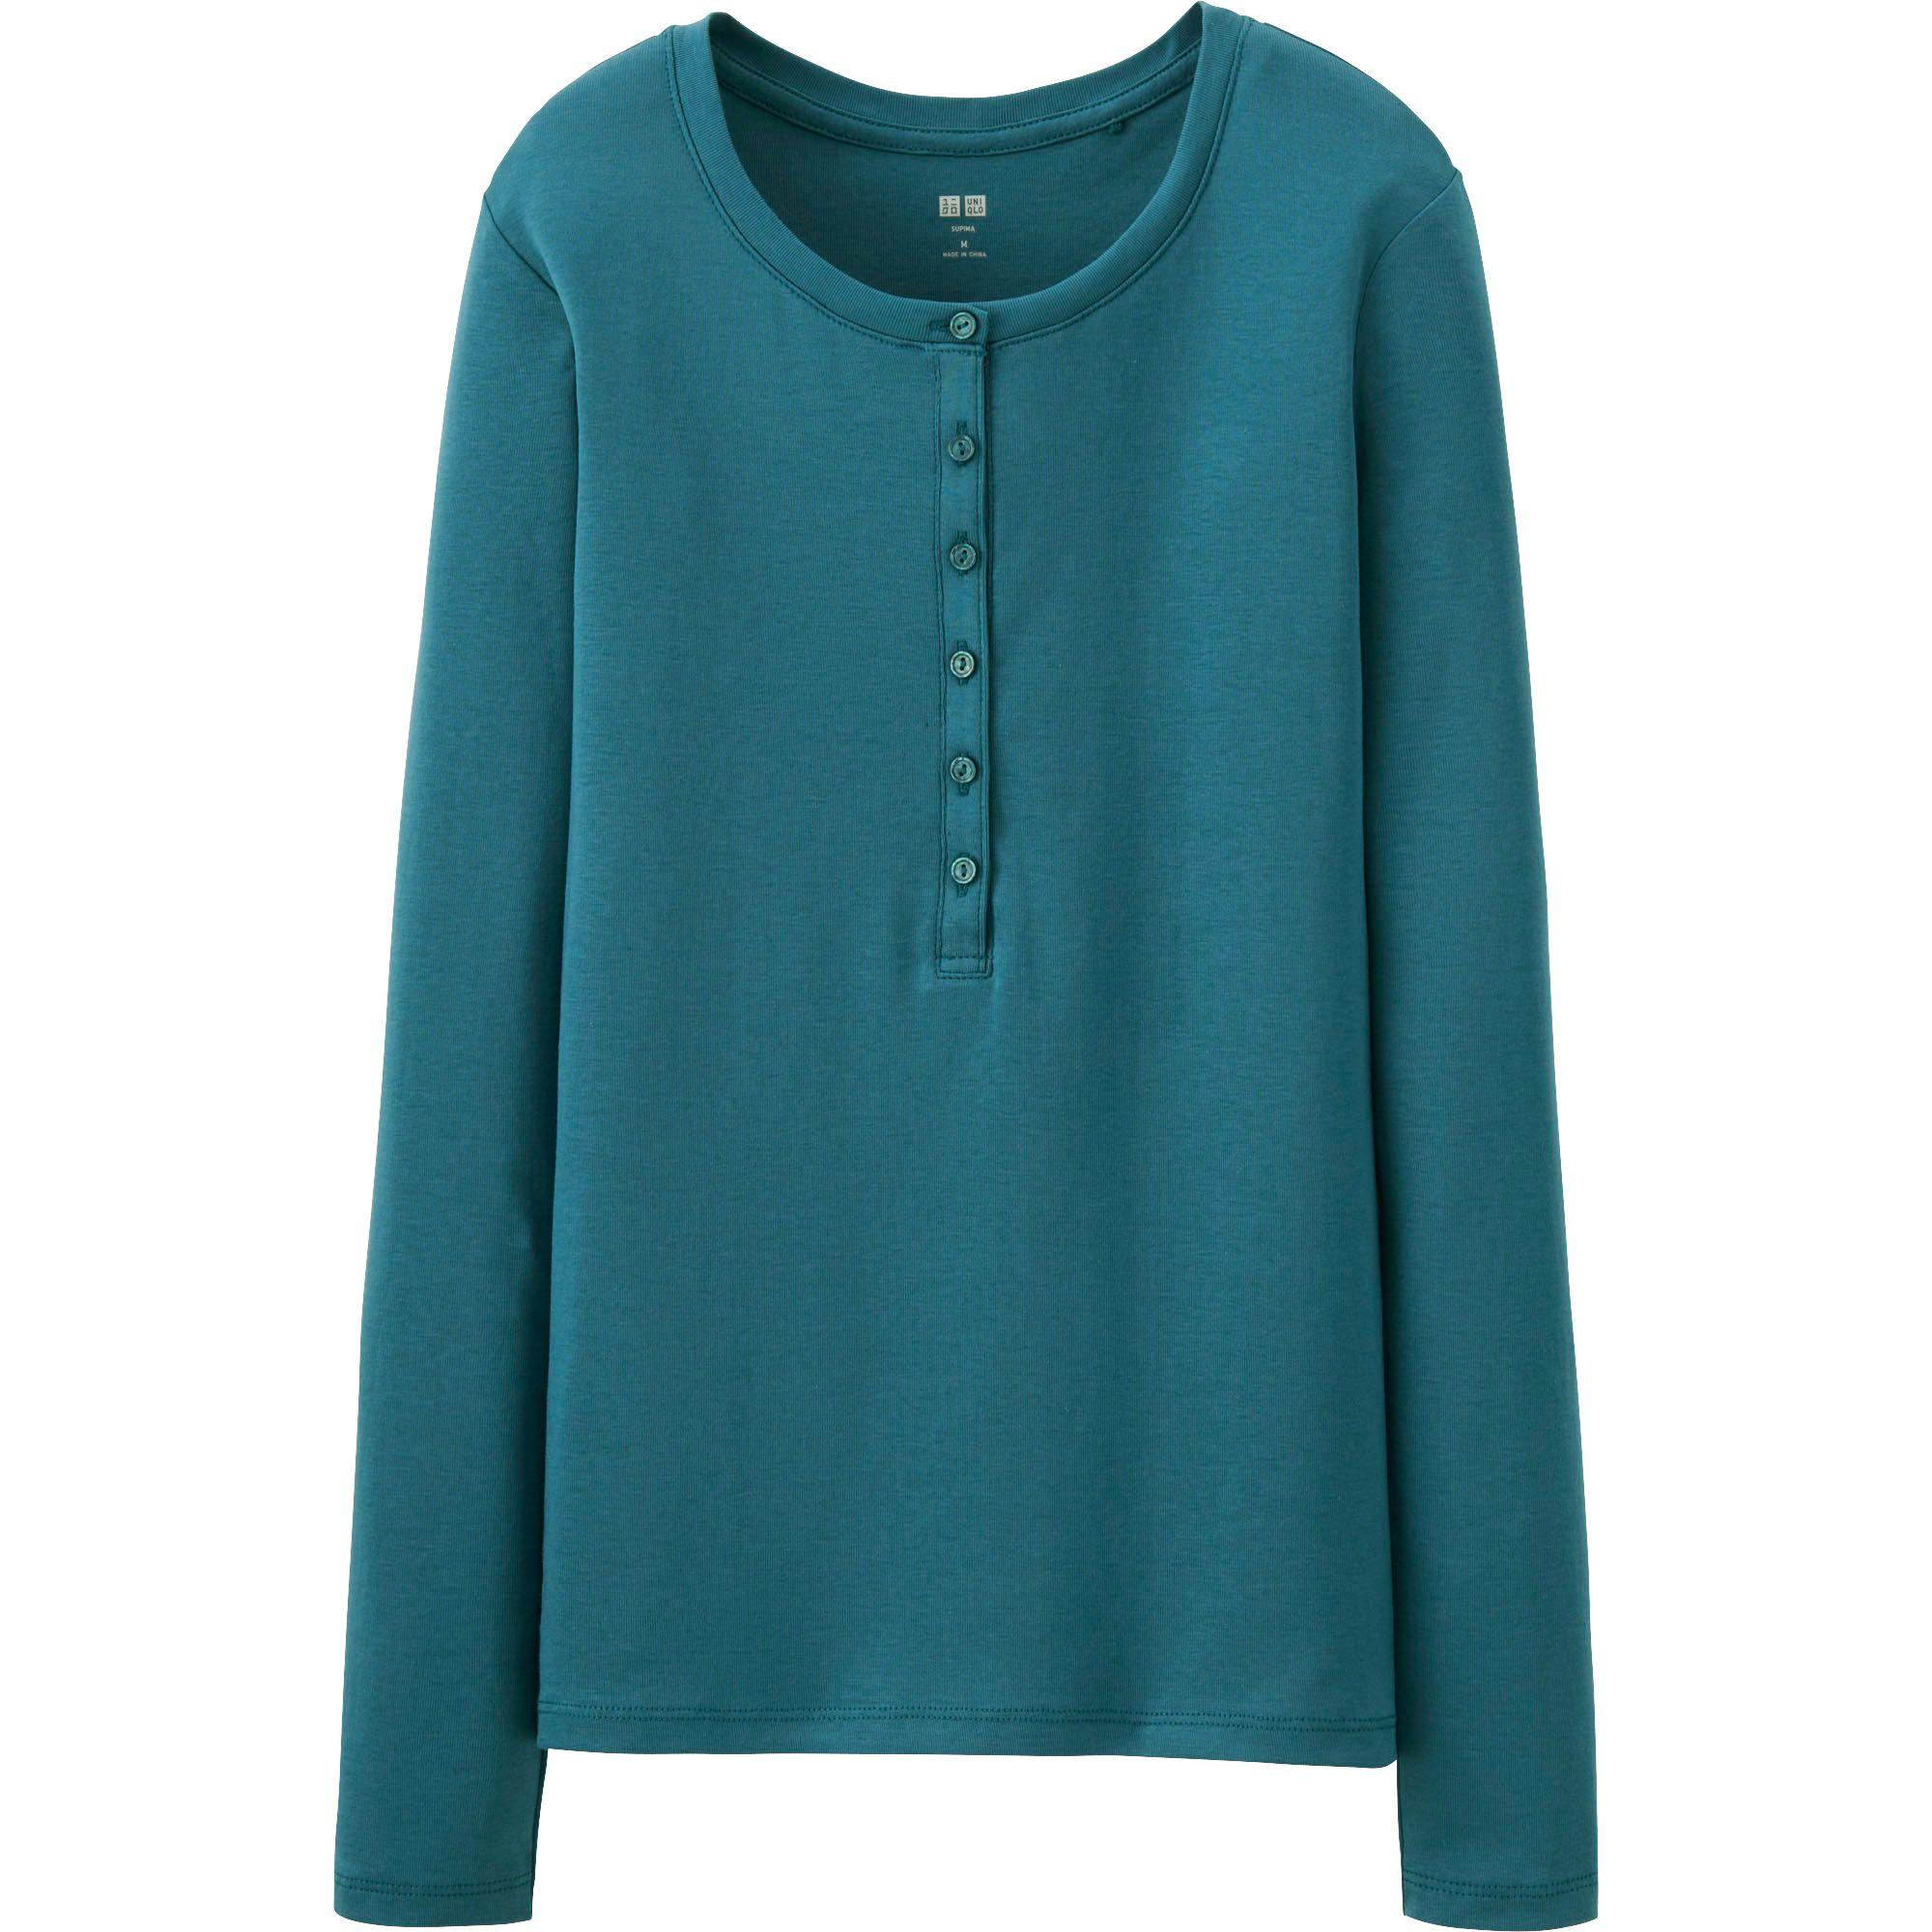 Uniqlo supima cotton henley neck long sleeve tshirt in for Supima cotton dress shirts